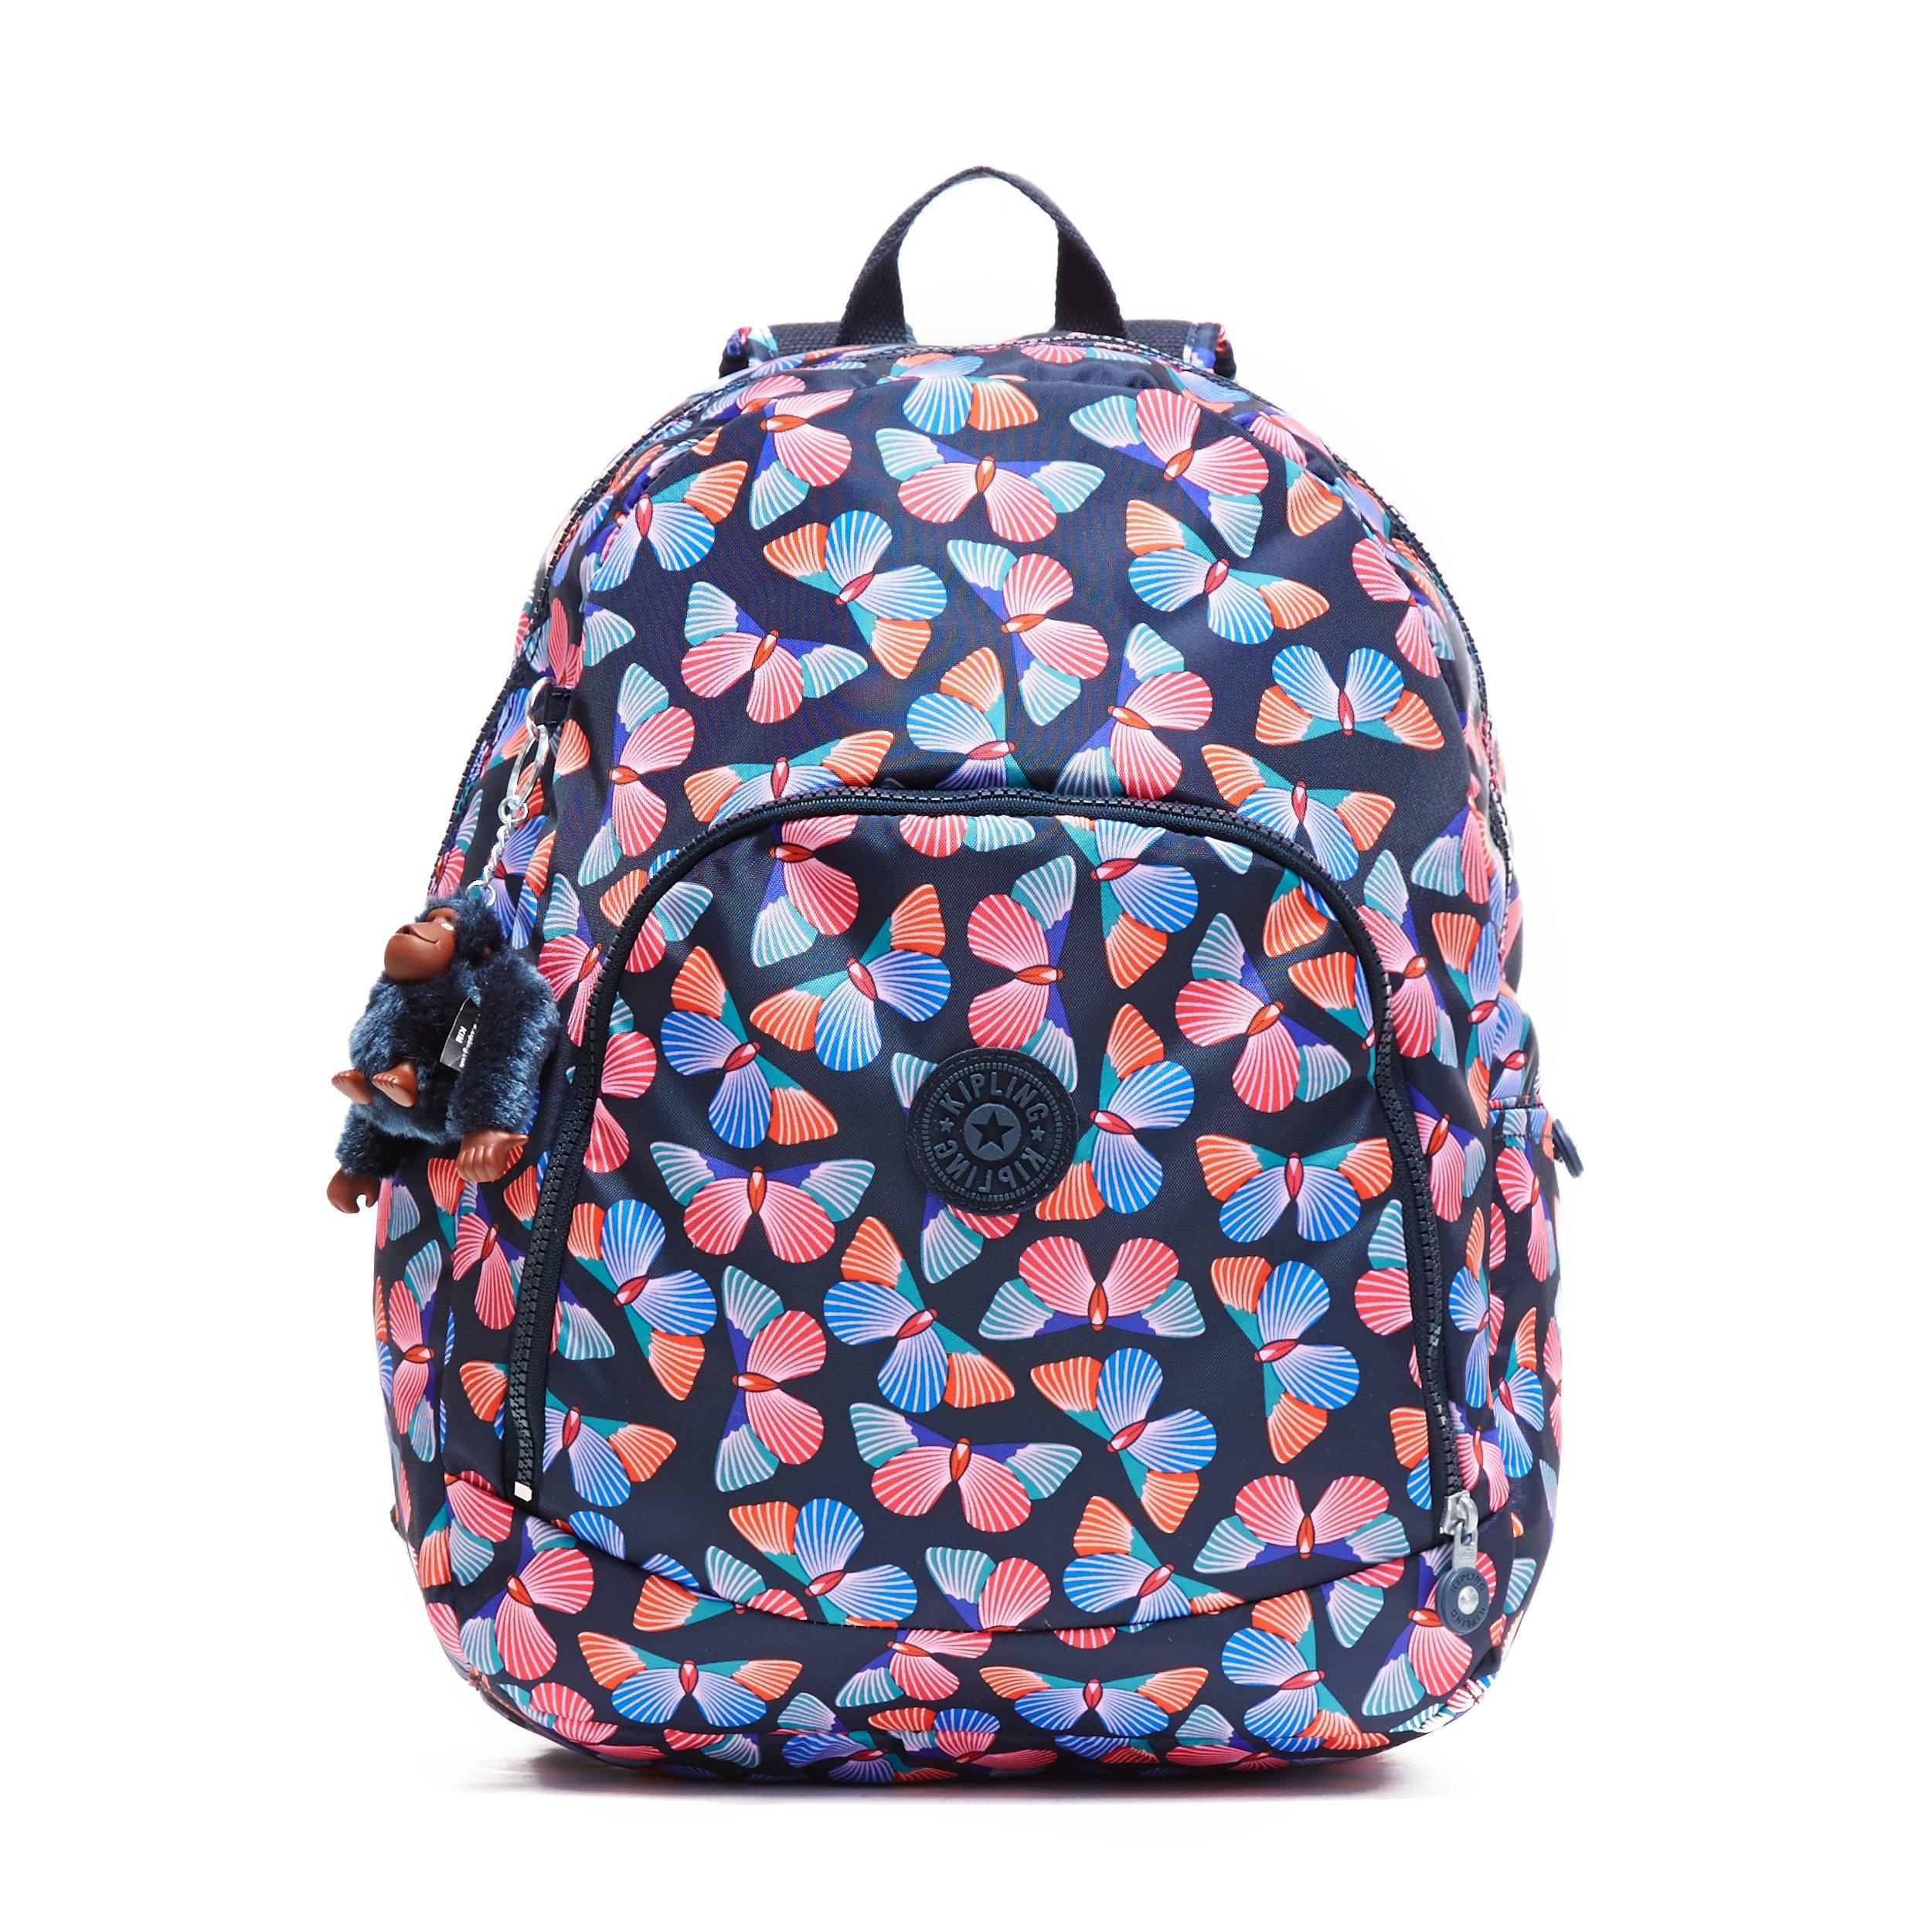 Kipling Carmine A bag, Flutterflies, One Size